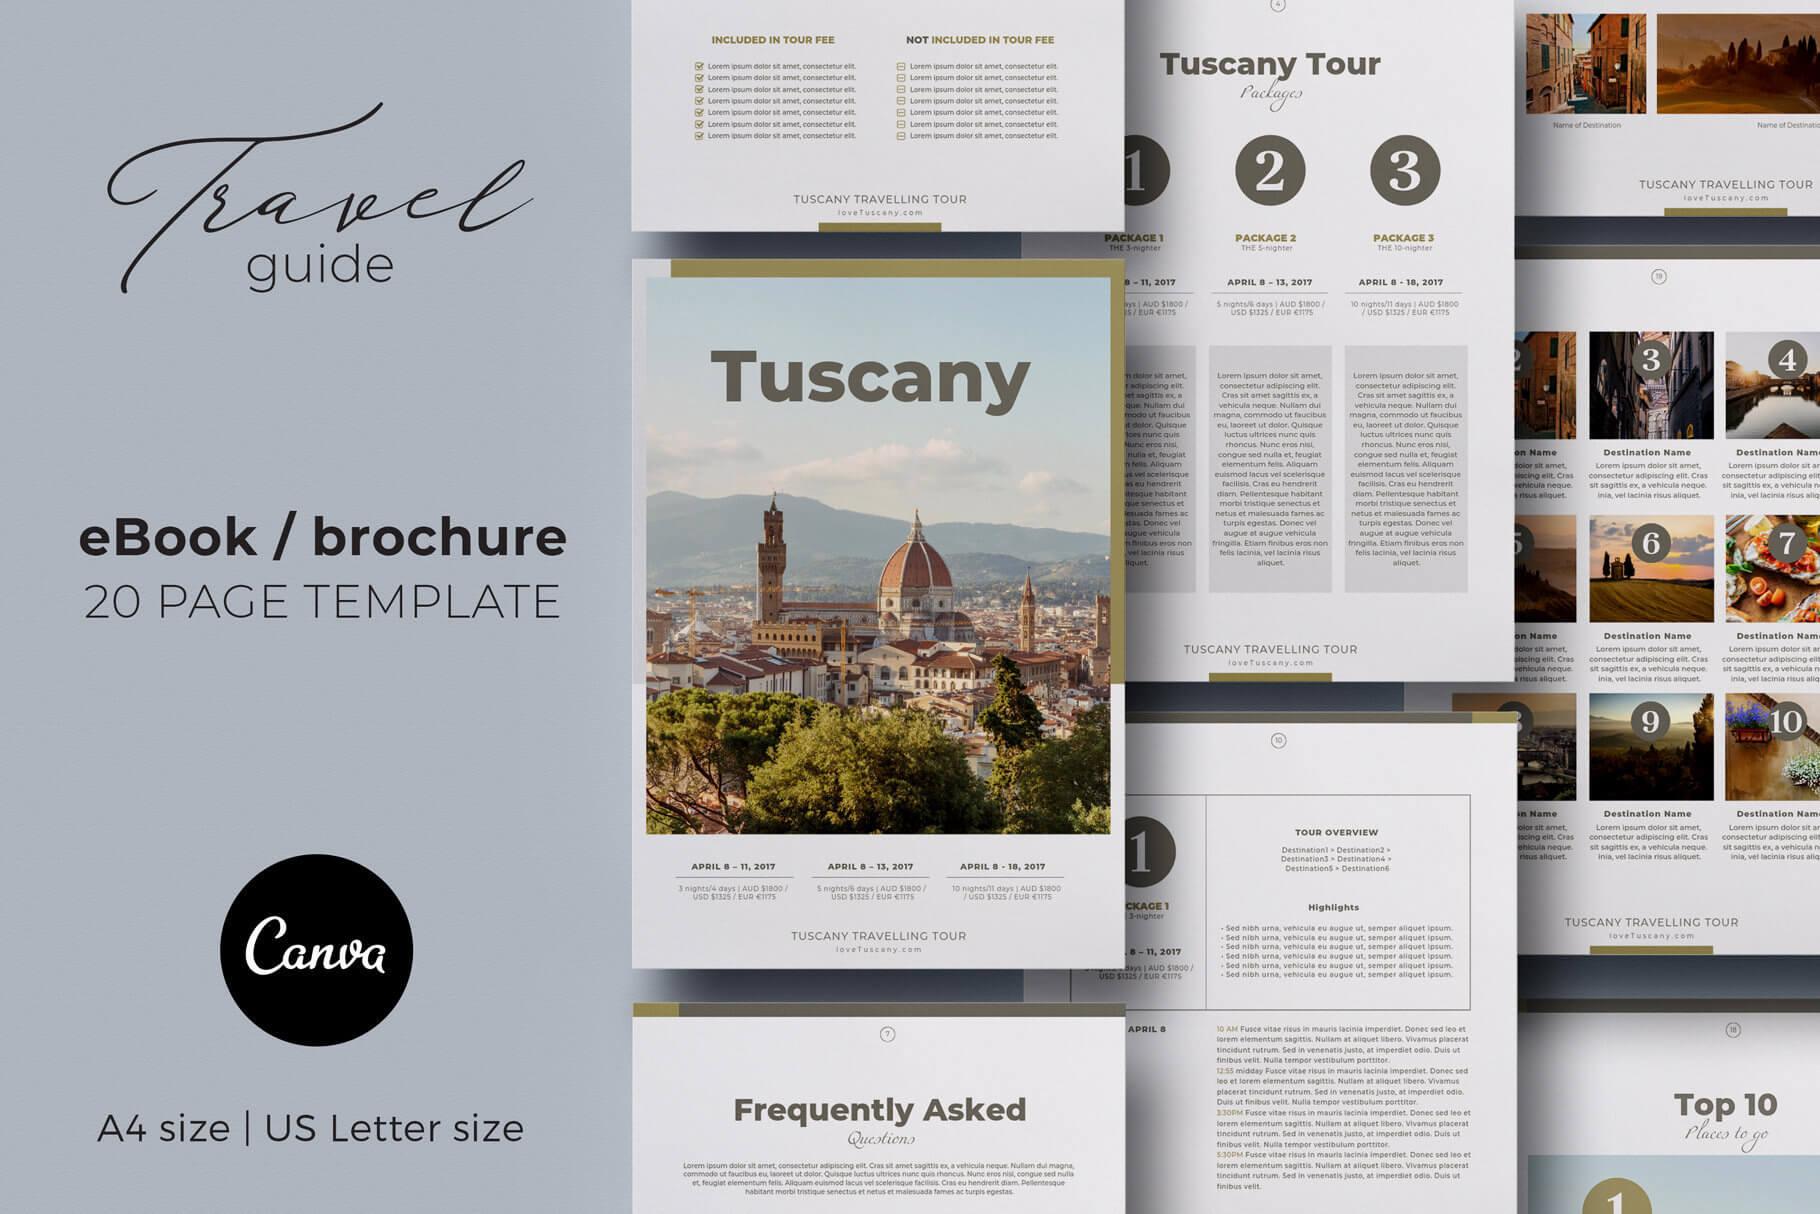 Canva Ebook / Brochure Travel Guide Template Intended For Travel Guide Brochure Template